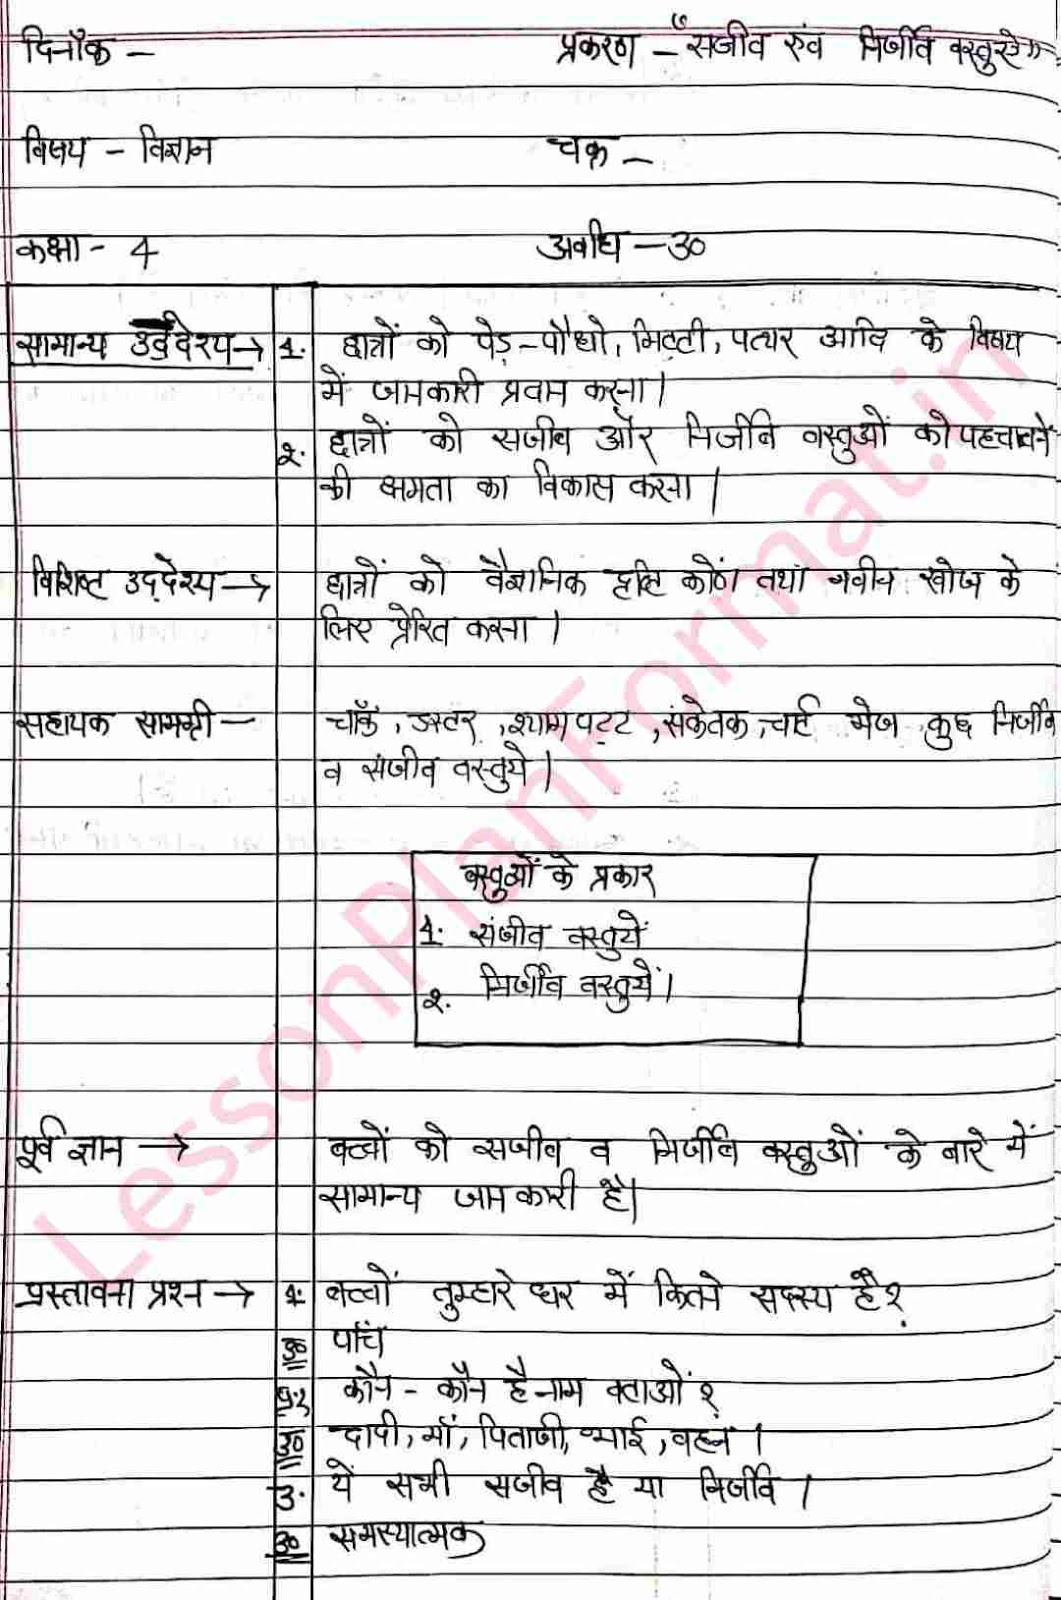 Science Lesson Plan | Sajeev and Nirjeev | Hindi